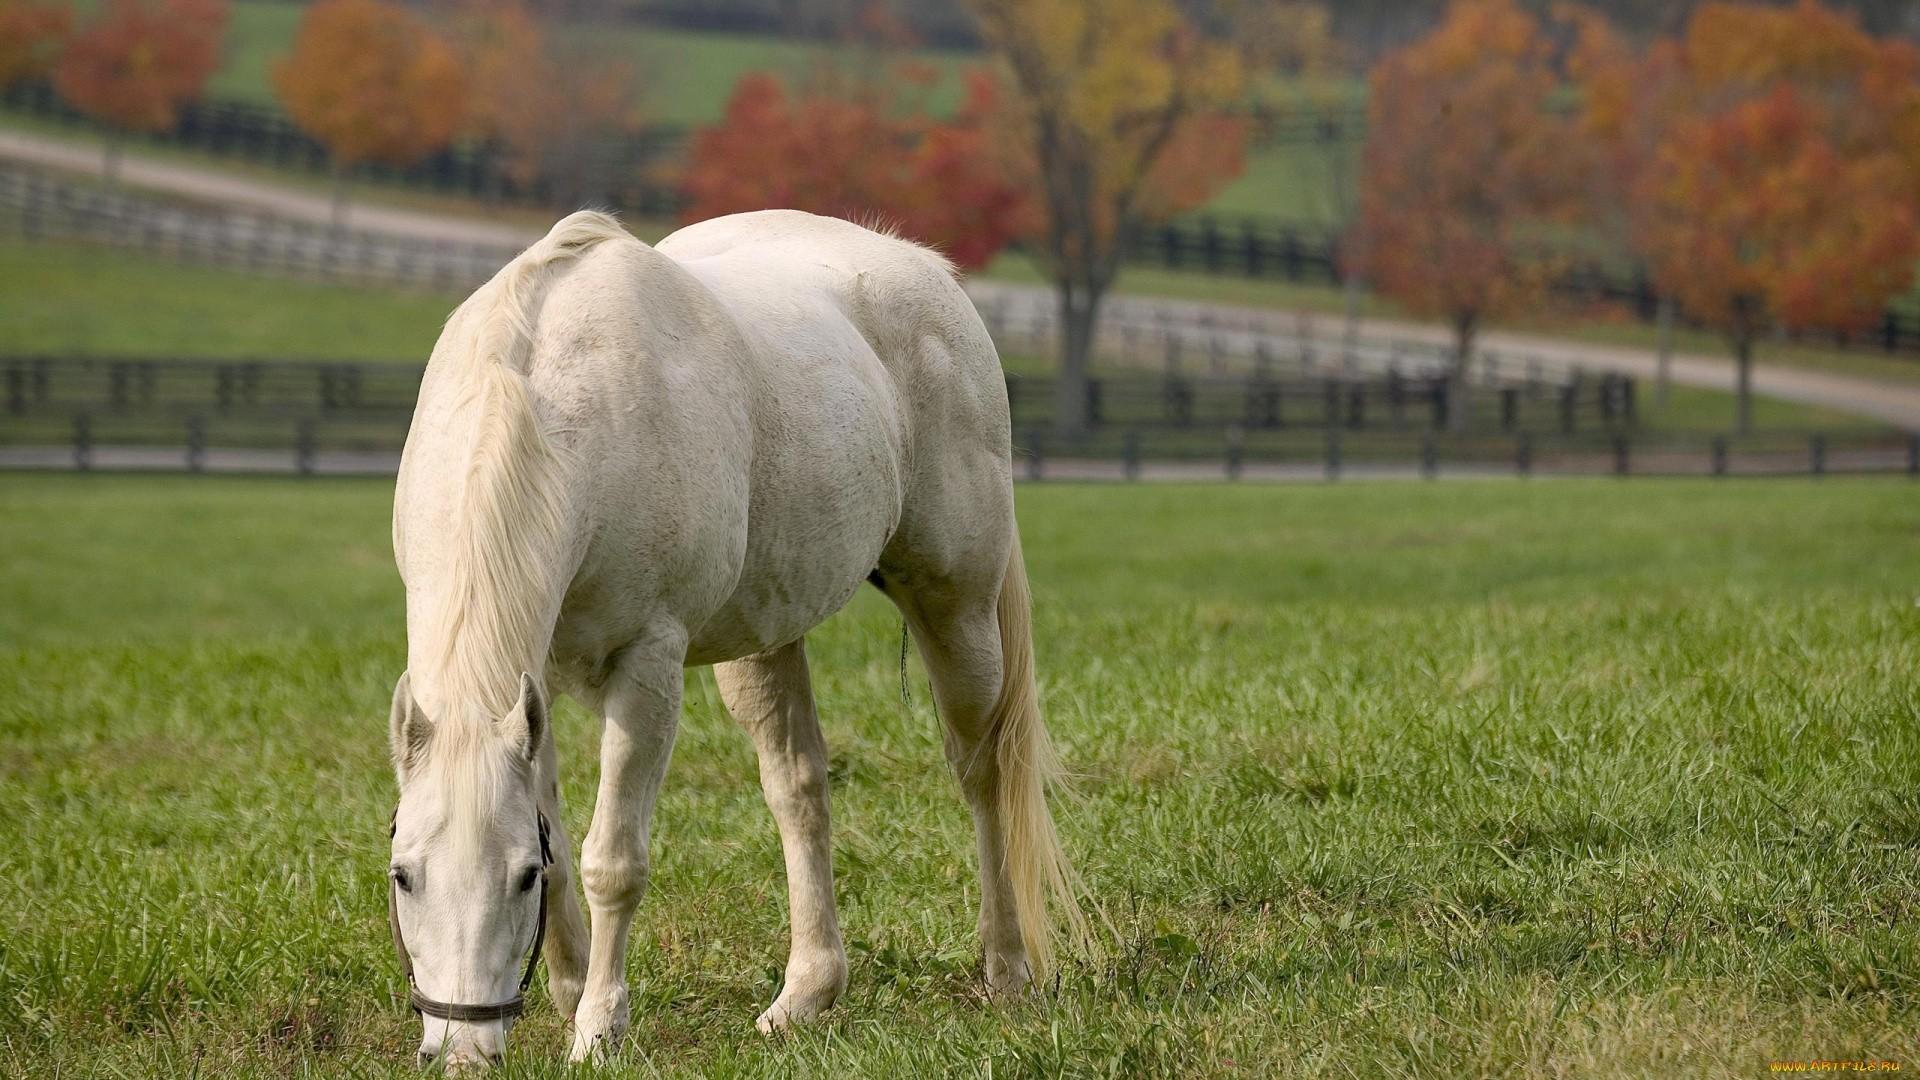 White Horse High Quality